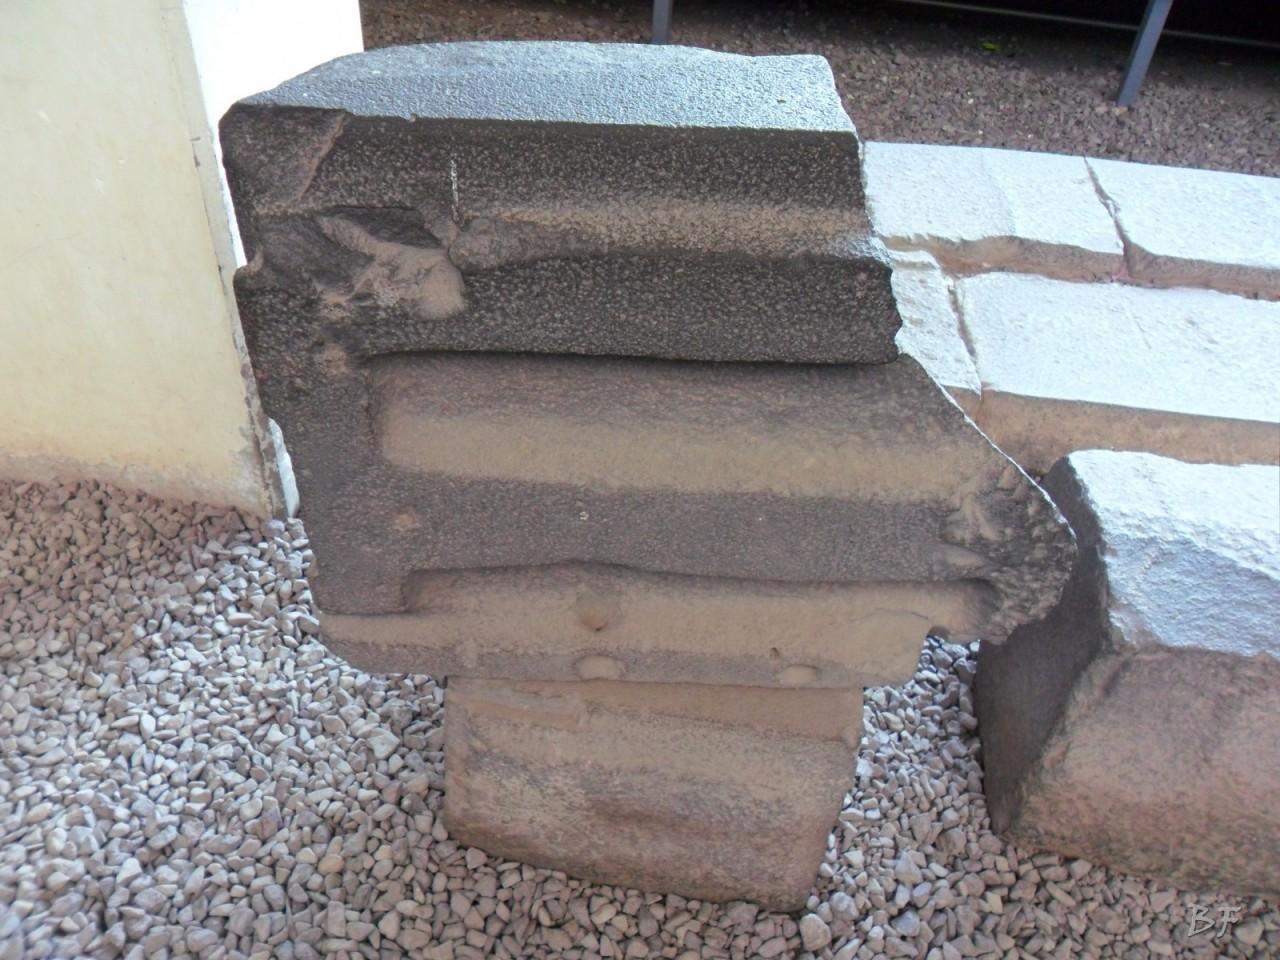 Mura-Poligonali-Megaliti-Tempio-Coricancha-Cusco-Perù-40